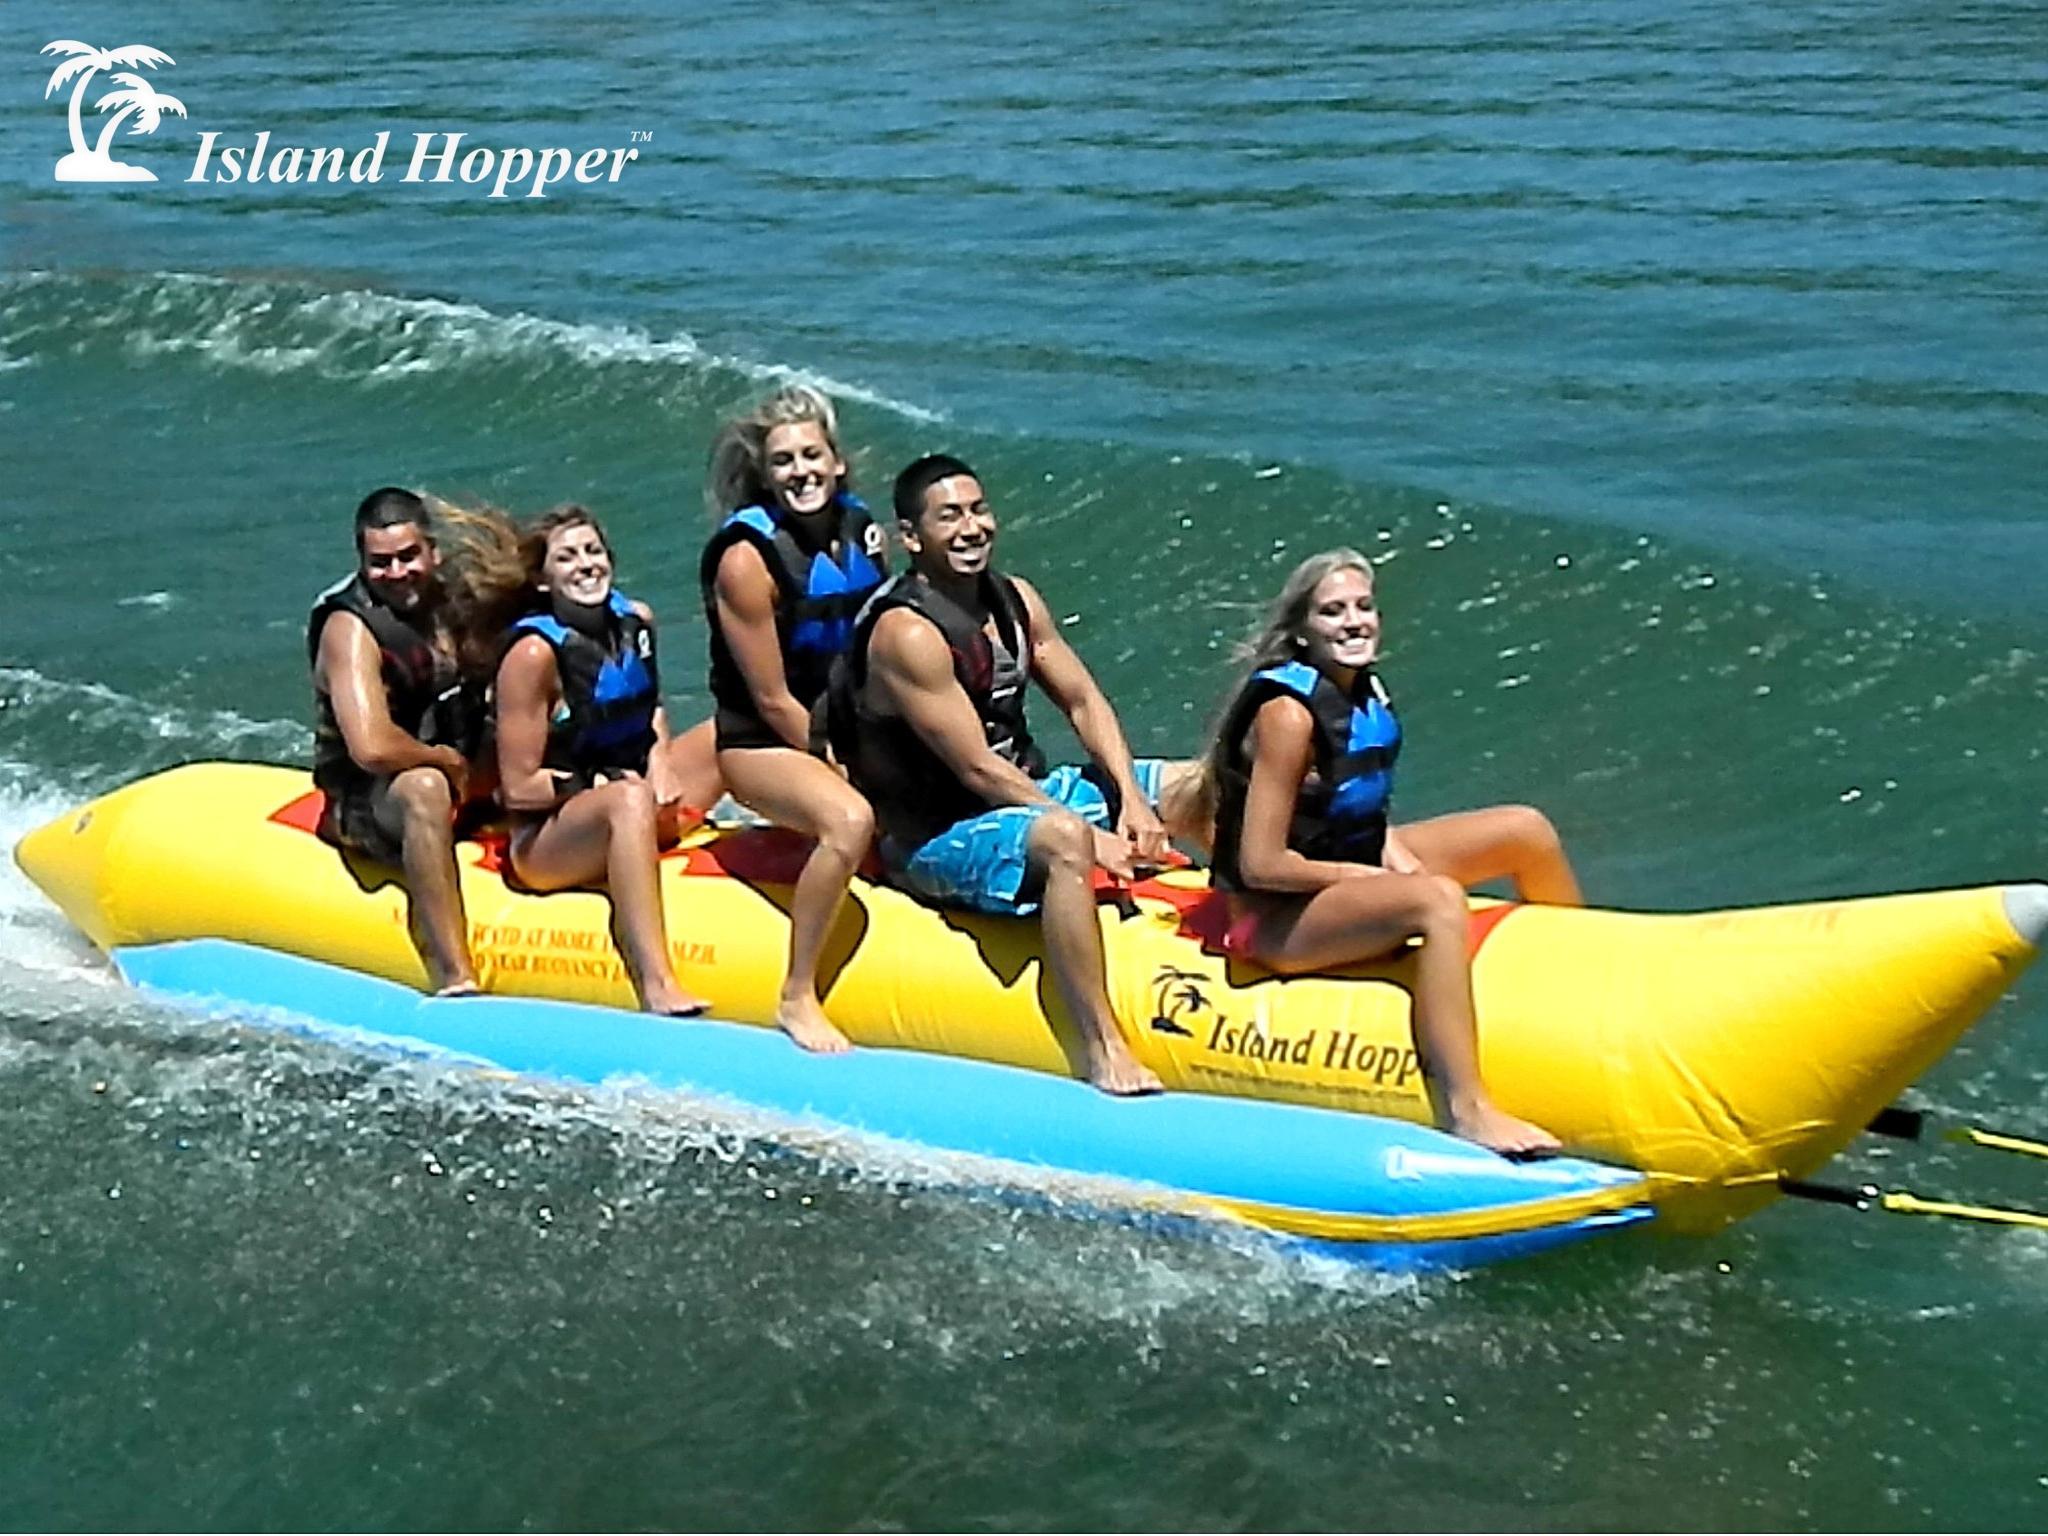 Island Hopper 5 Person Inflatable Banana Boat